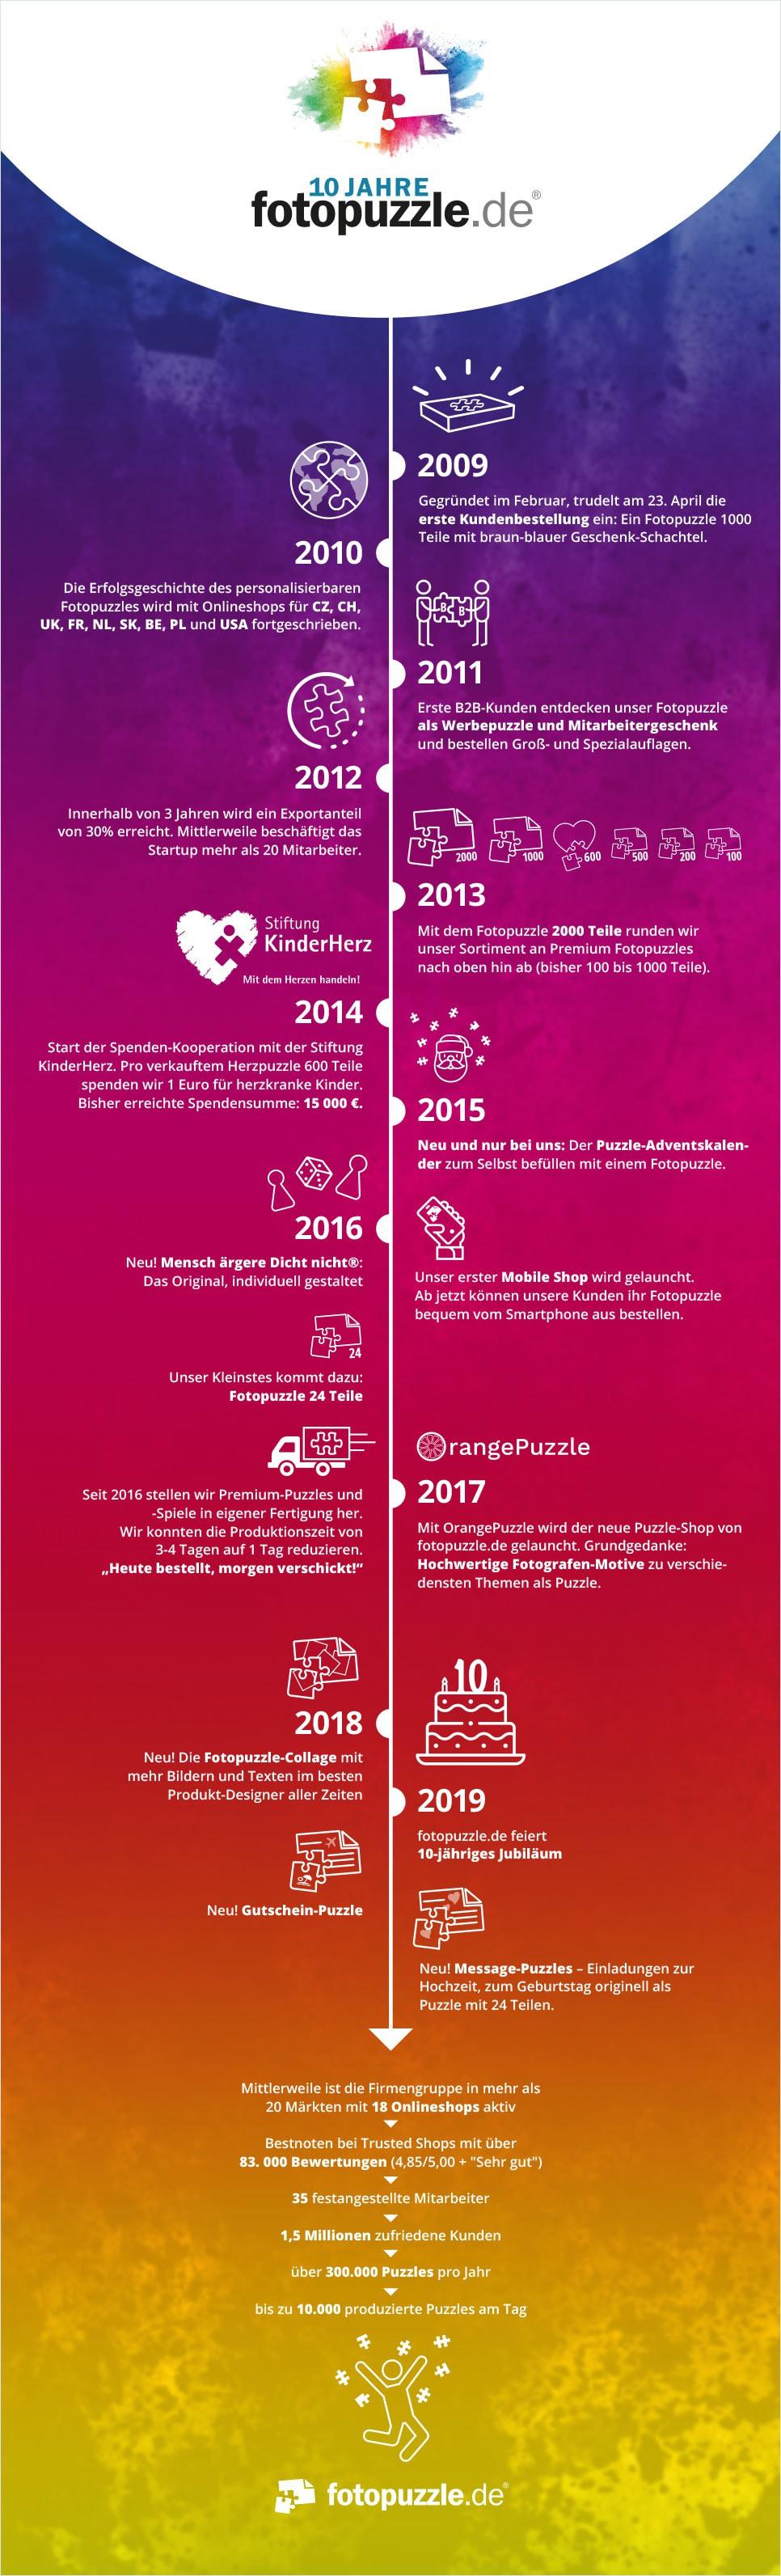 10. Geburtstag von fotopuzzle.de